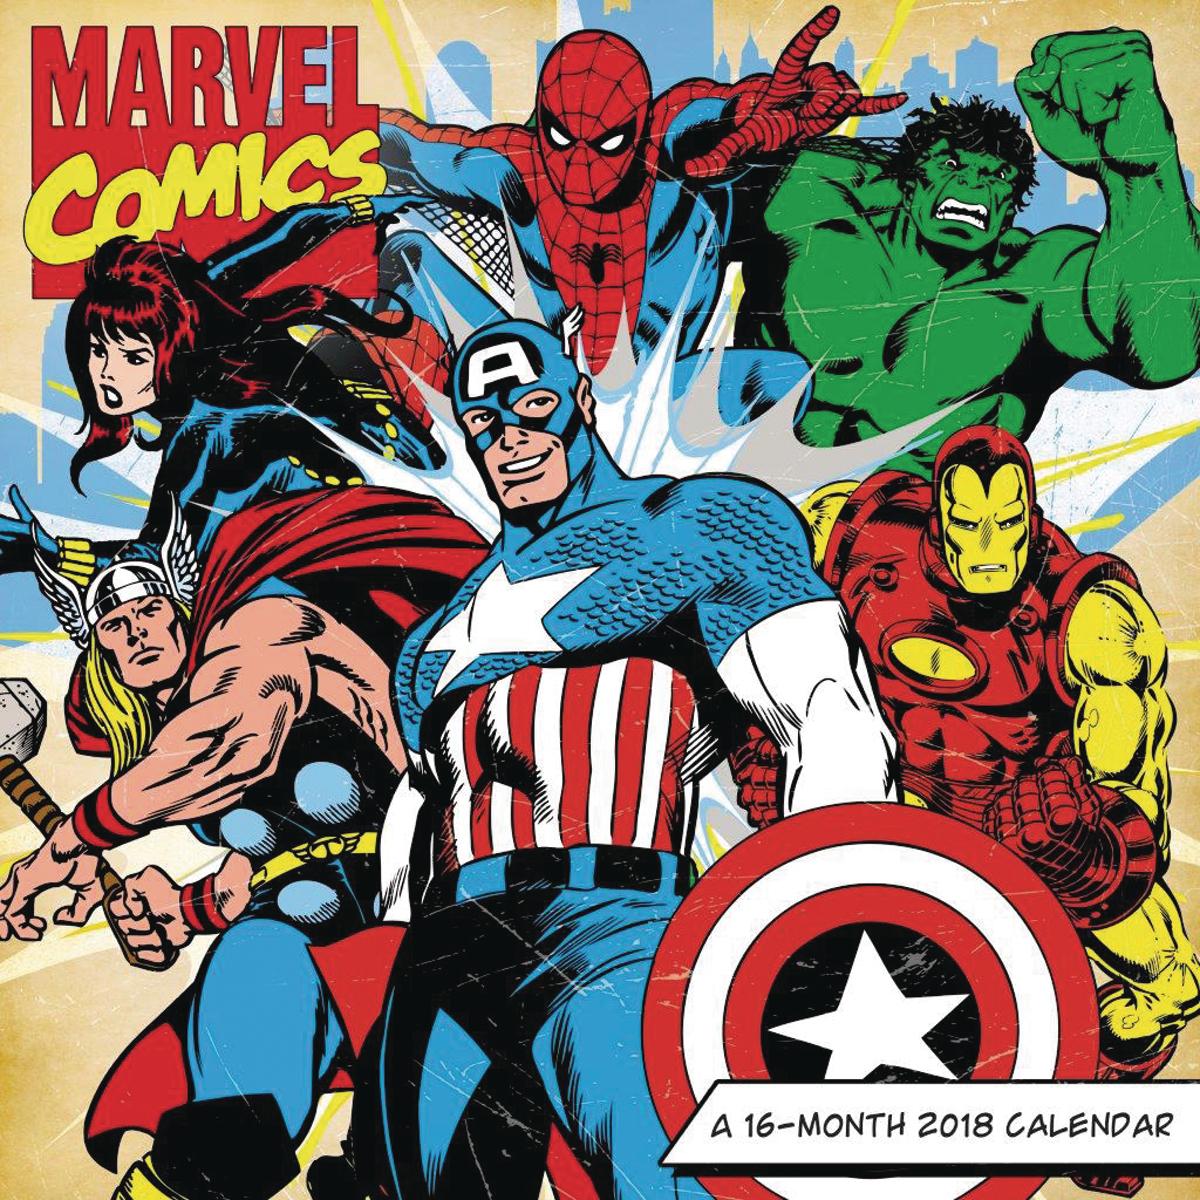 Free Comic Book Day Wallpaper: MARVEL COMICS RETRO 16 MONTH 2018 WALL